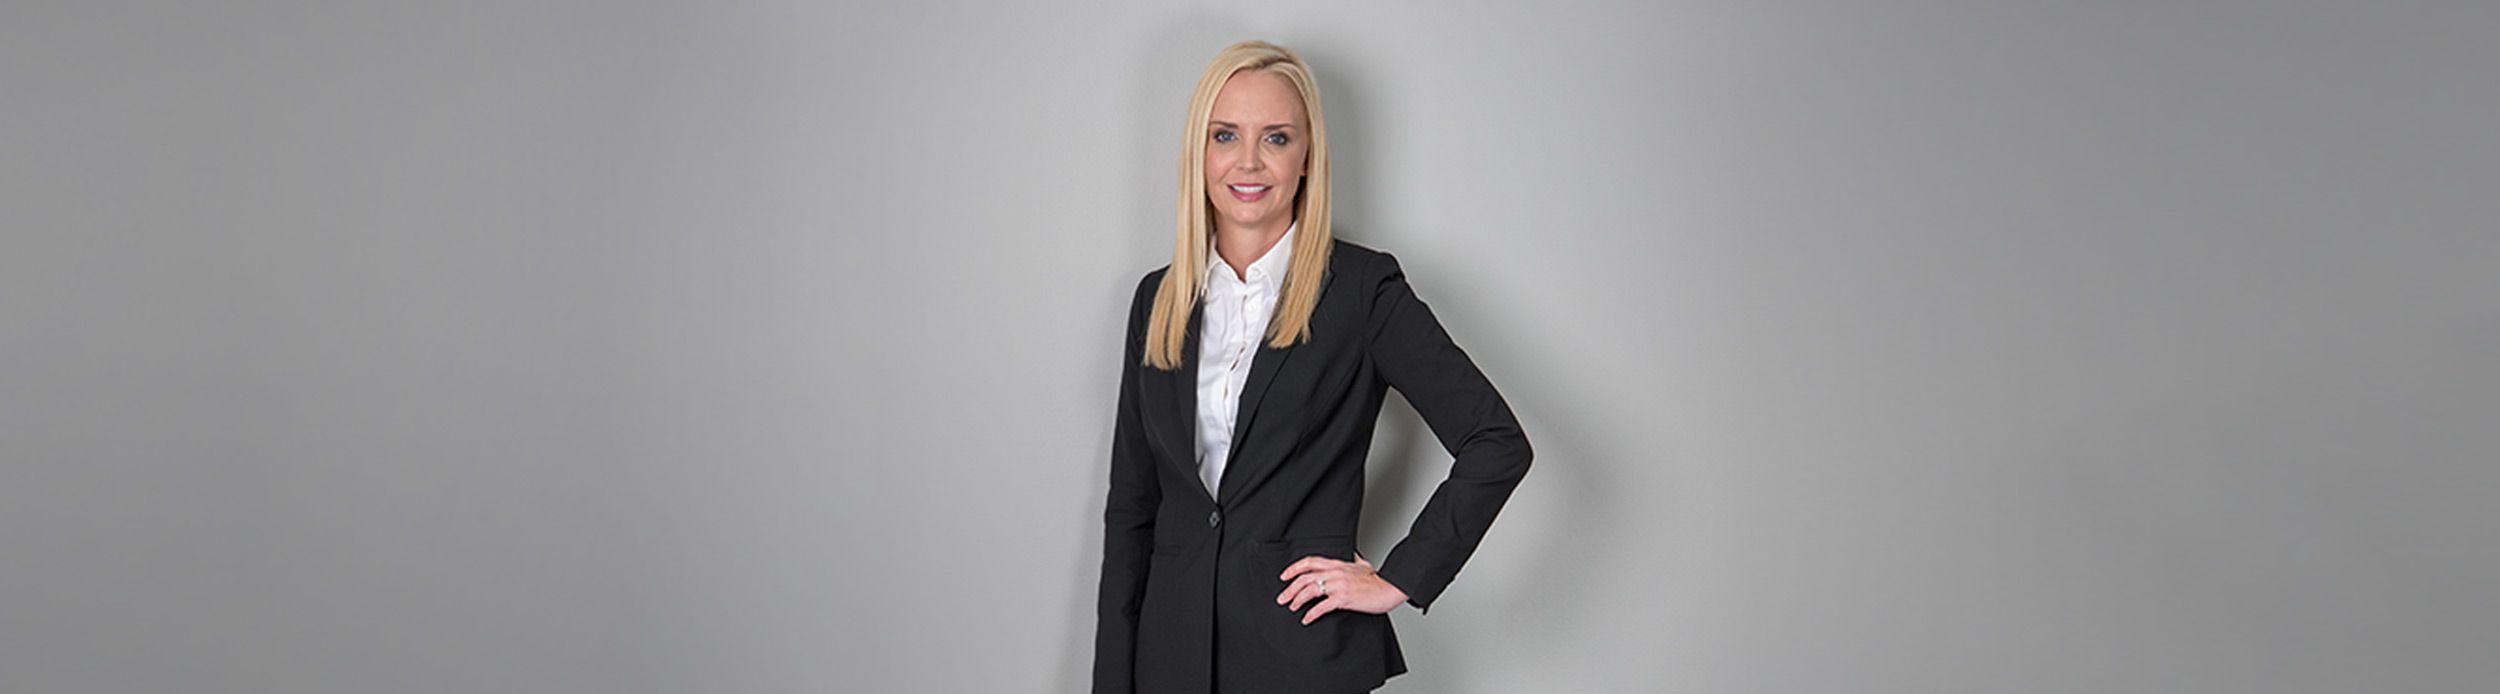 Portrait of Dr. Brenda Schiesel in a suit